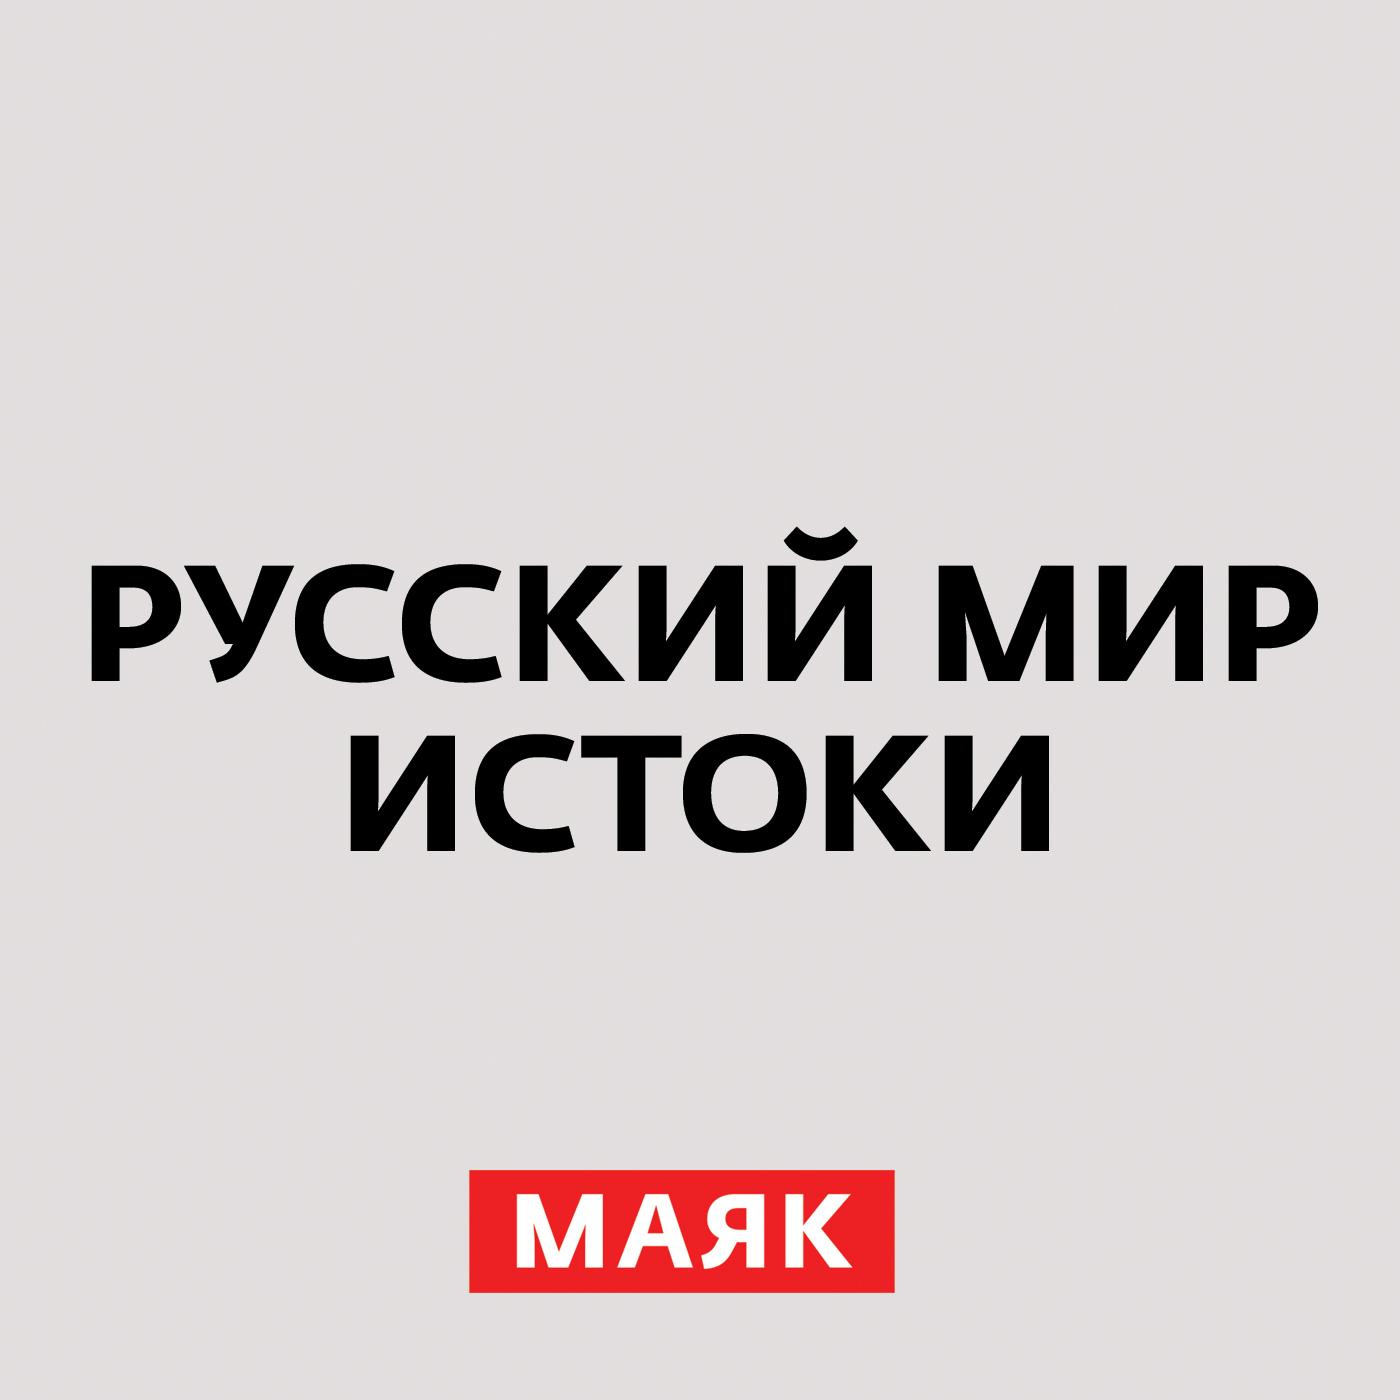 Творческий коллектив радио «Маяк» Анна Иоанновна (часть 3) творческий коллектив радио маяк екатерина ii часть 3